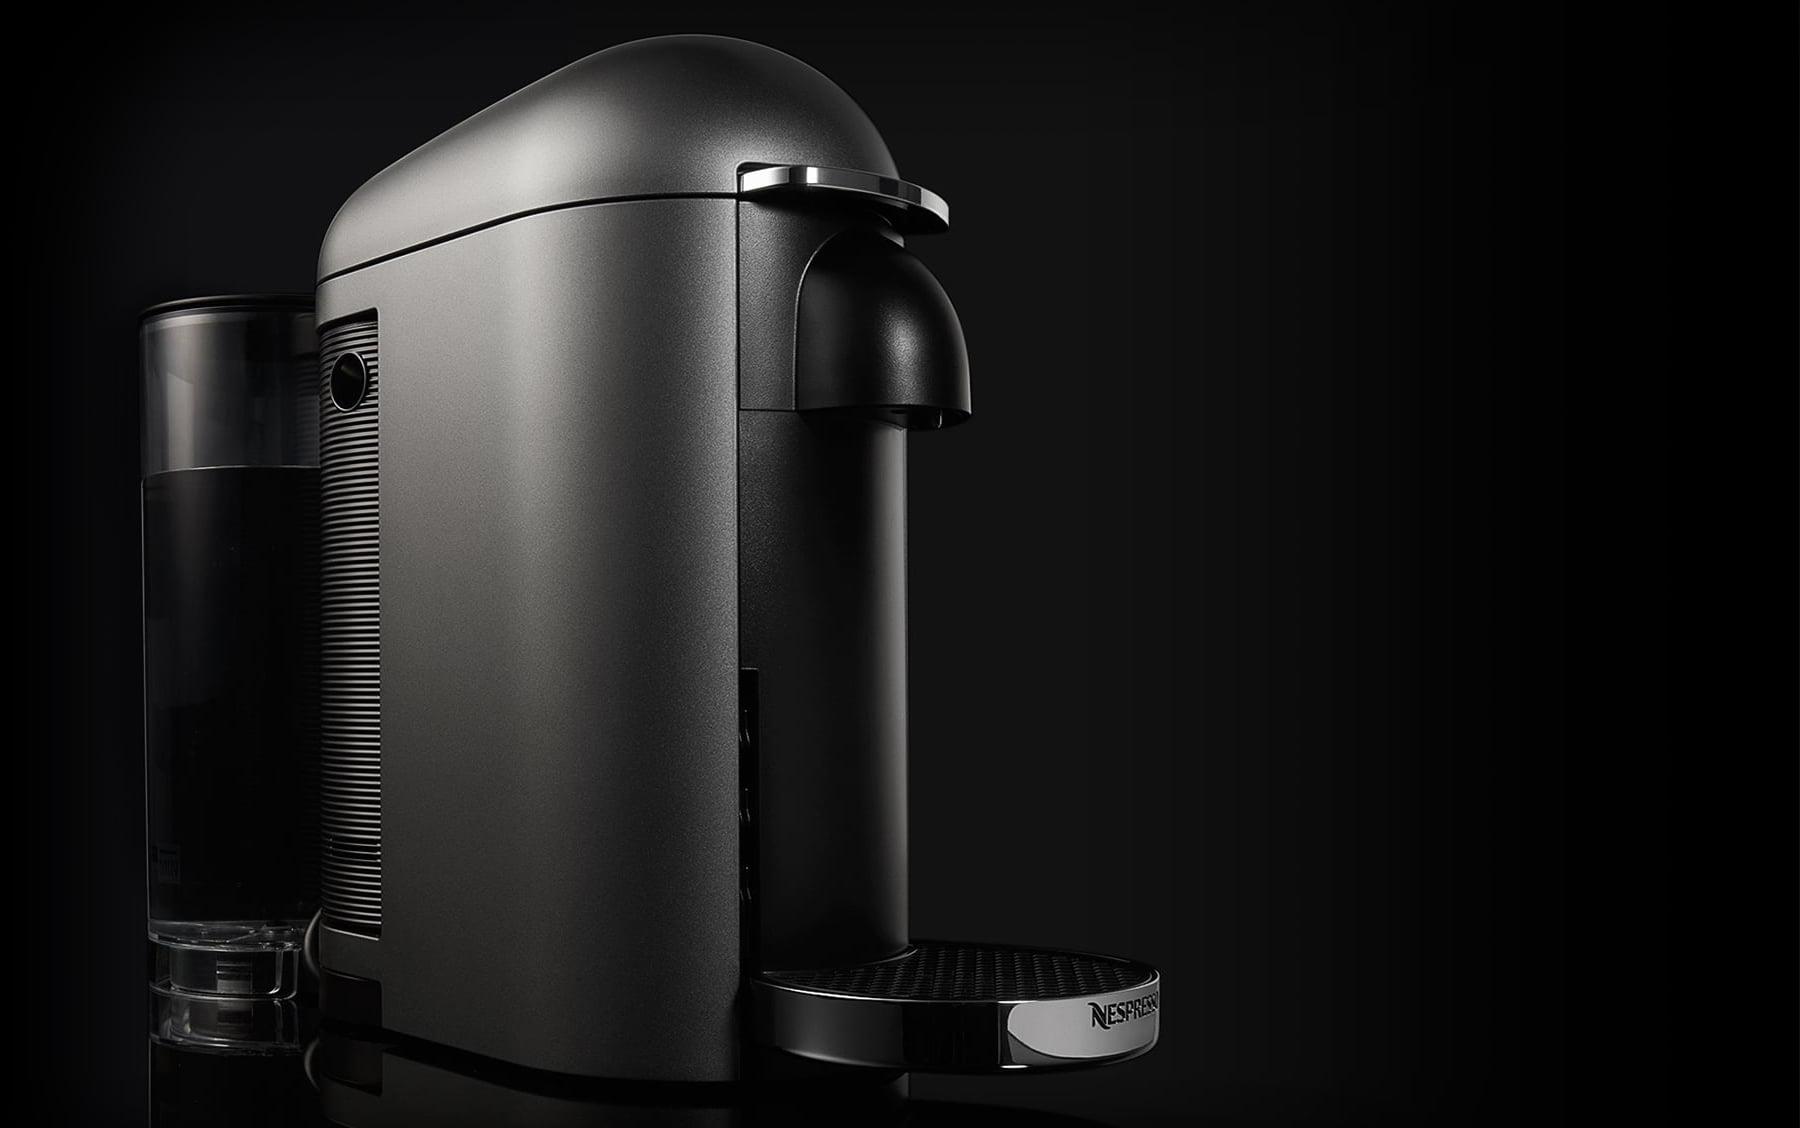 test de la nespresso vertuo le go t du risque. Black Bedroom Furniture Sets. Home Design Ideas